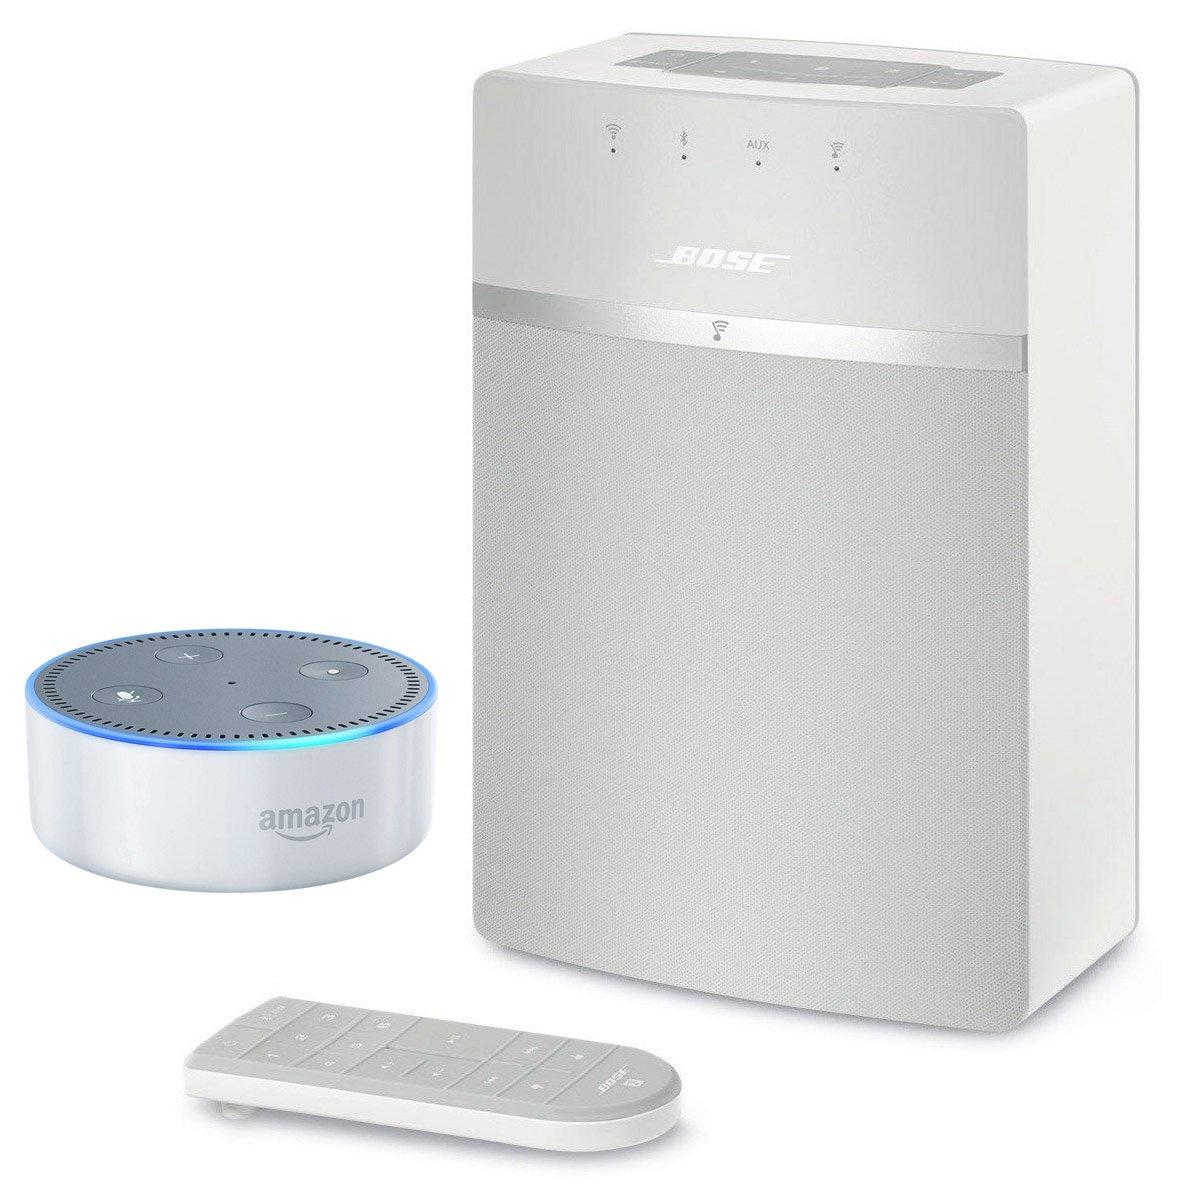 Bose SoundTouch 10 wireless music system & Amazon Echo Dot Package by Bose-Amazon